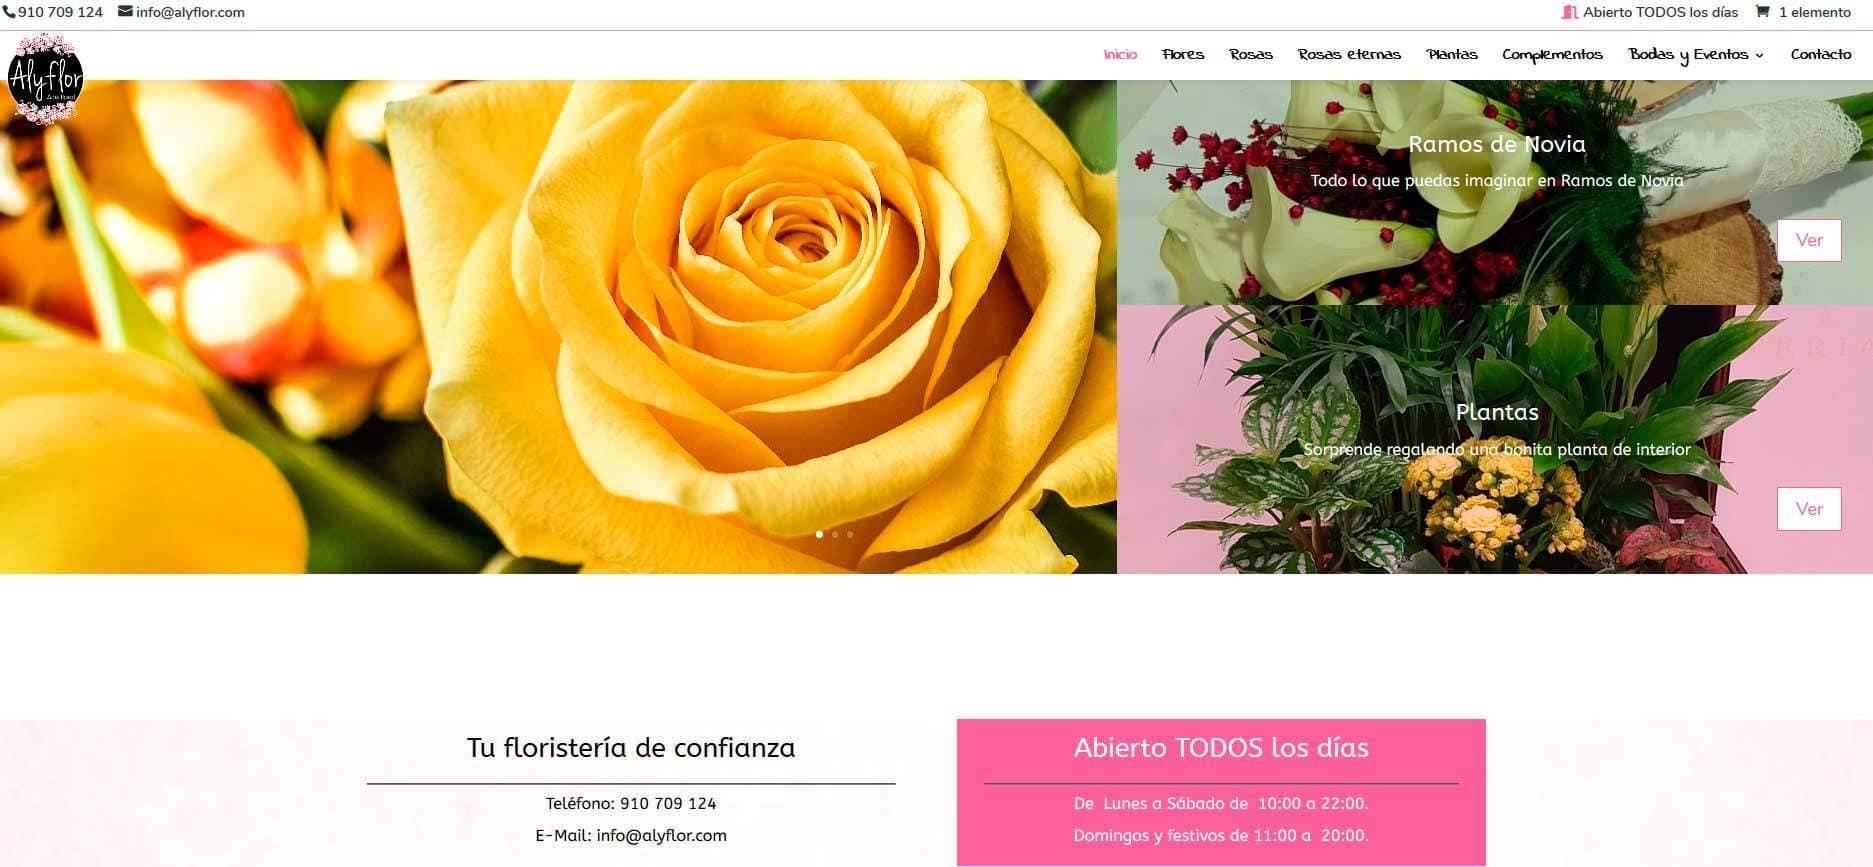 Pagina Web Floristeria Torrejon Madrid